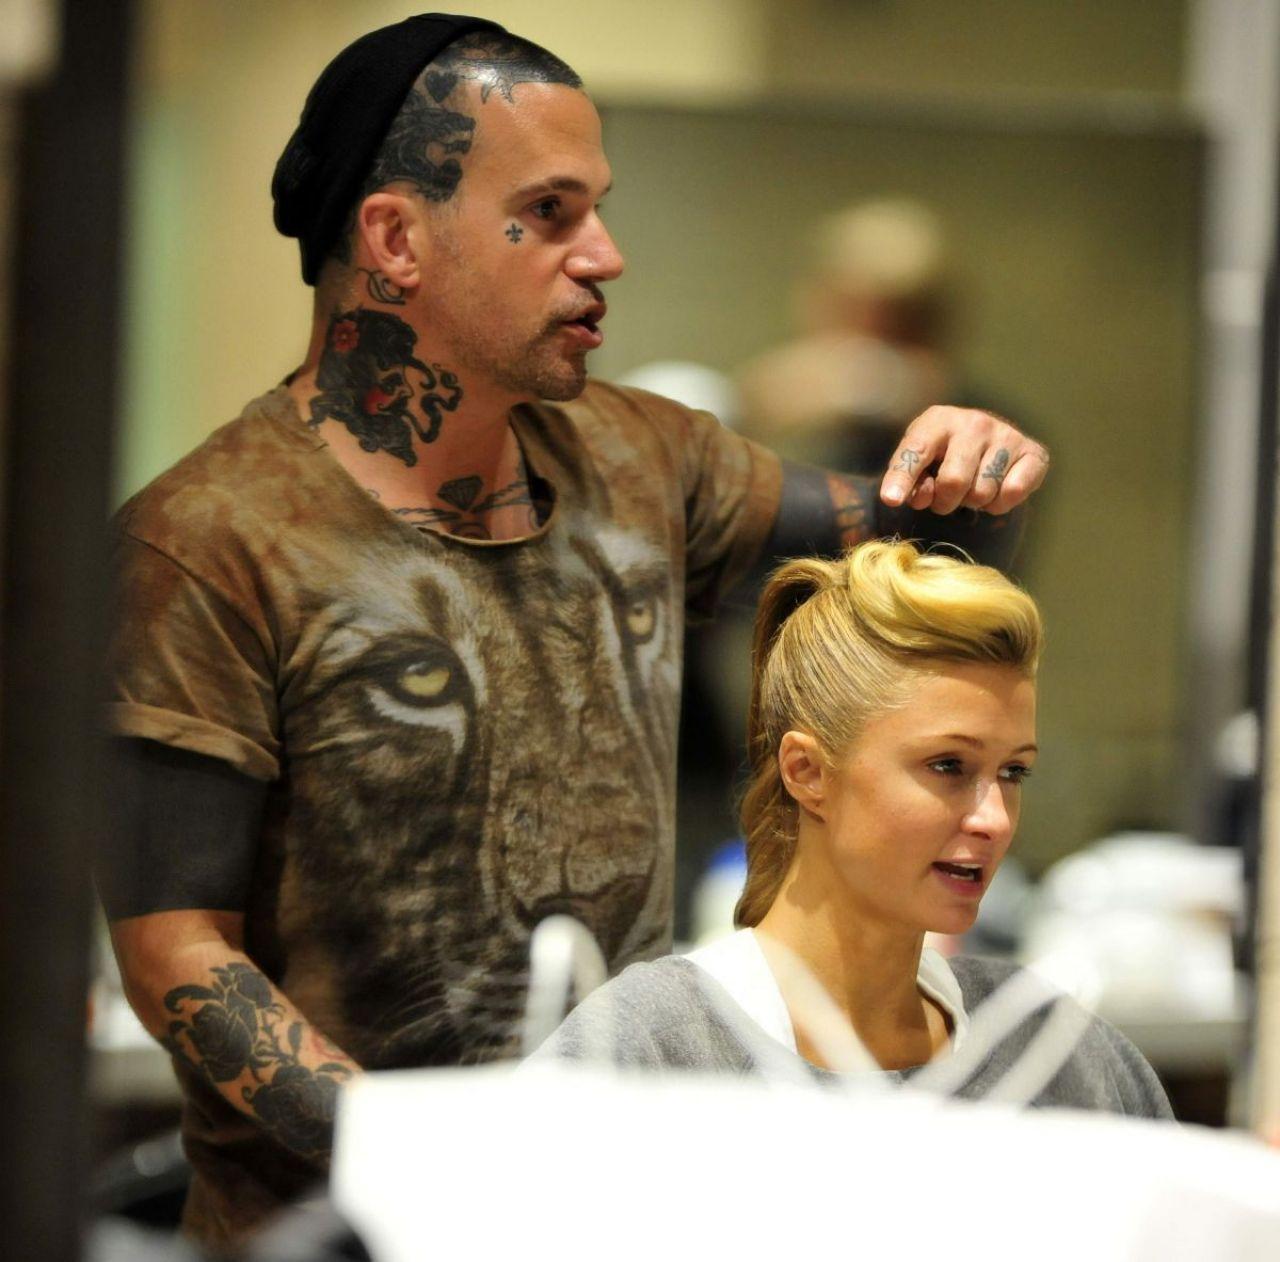 Hair Salon Los Angeles: Paris Hilton At Meche Hair Salon In Los Angeles